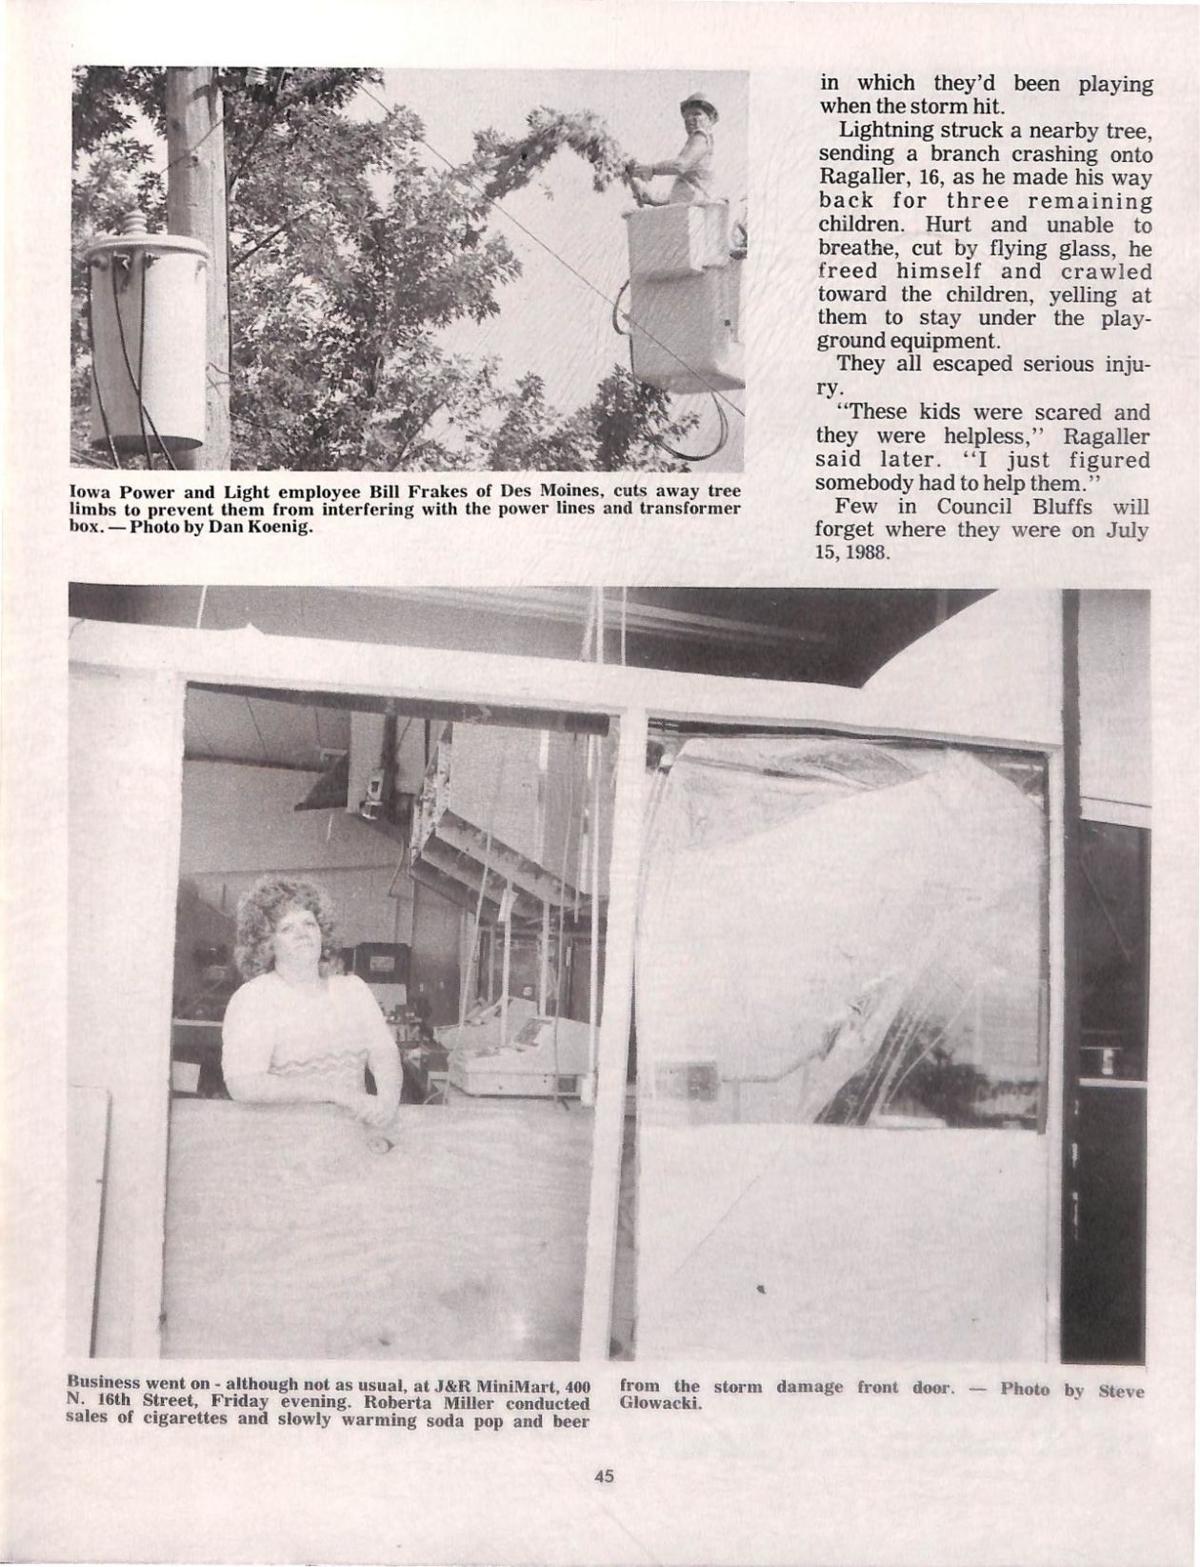 Nonpareil 1988 tornado special section_Part47 pdf